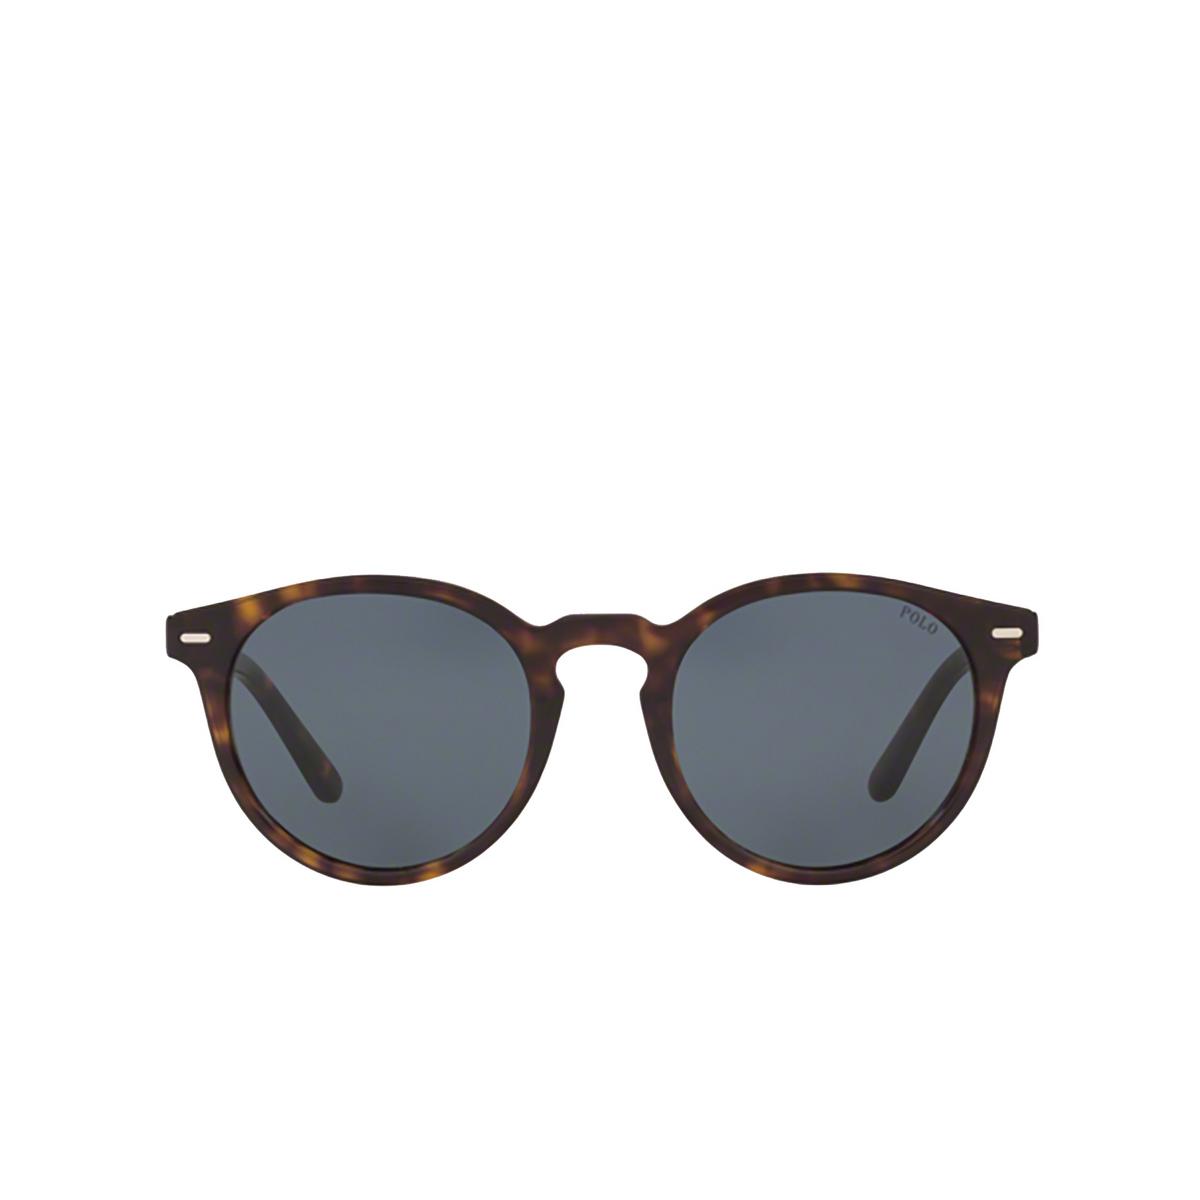 Polo Ralph Lauren® Round Sunglasses: PH4151 color Shiny Dark Havana 500387 - front view.